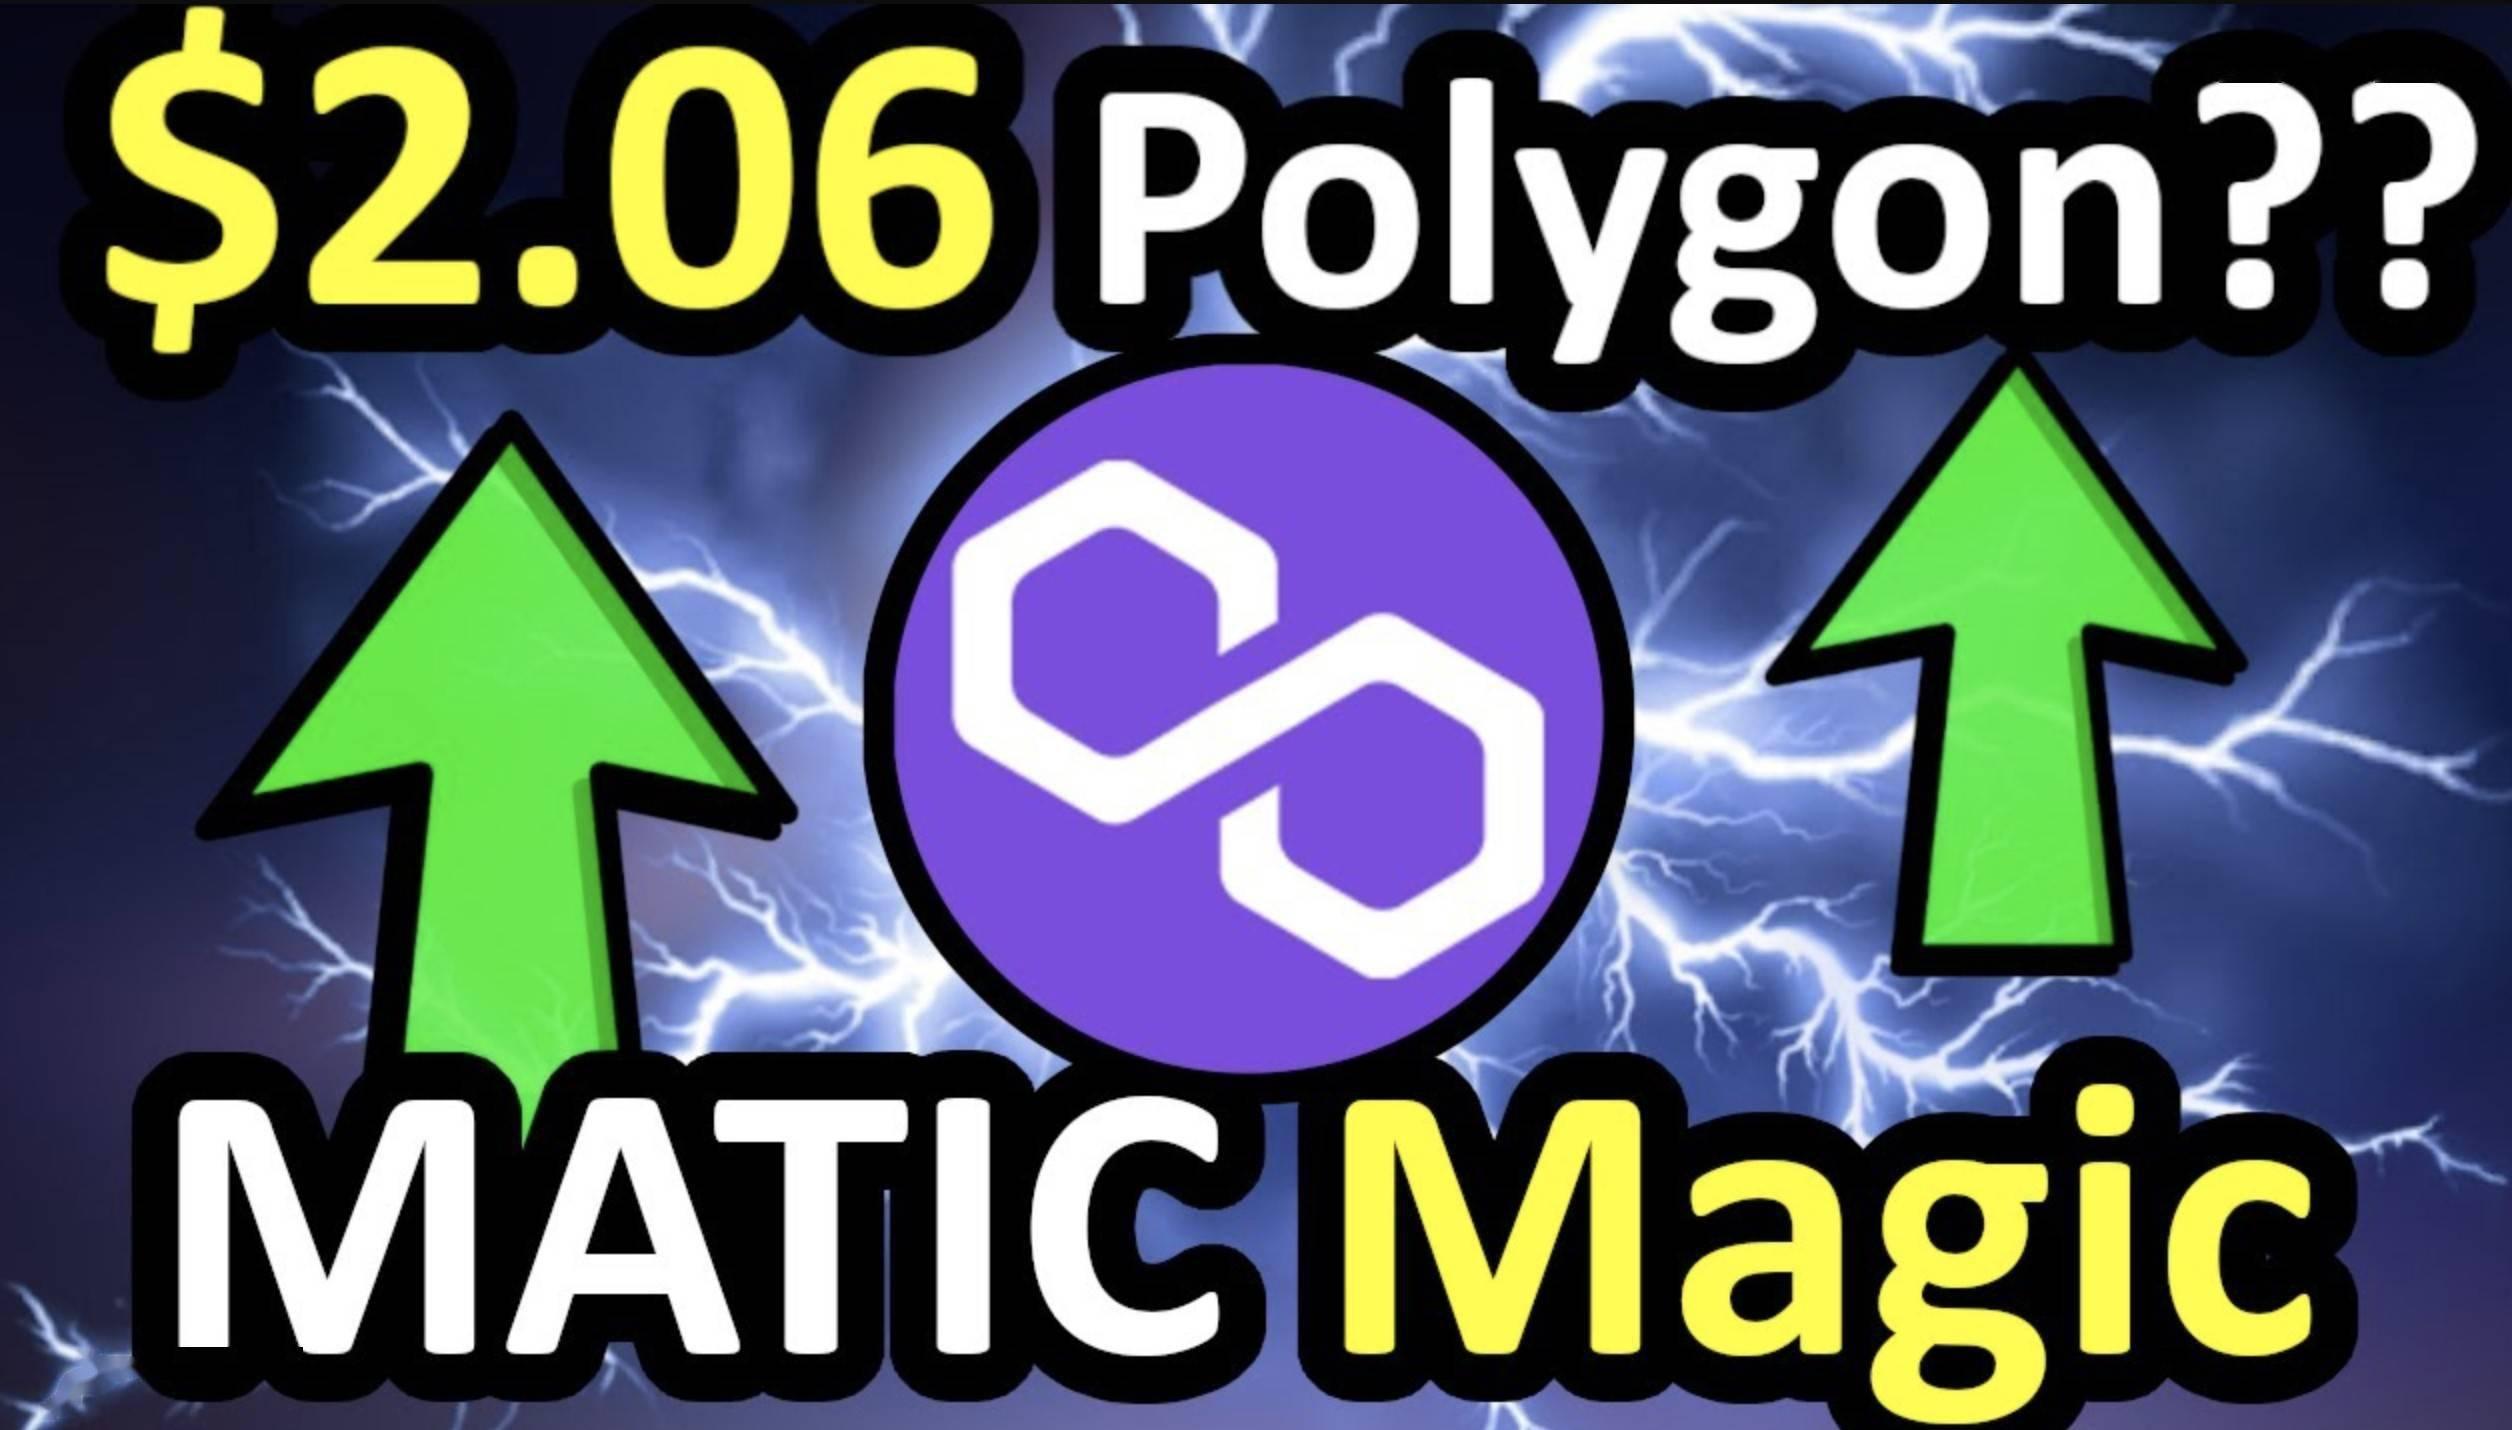 Polygon (MATIC) 生态被低估,现应接近3美元  第2张 Polygon (MATIC) 生态被低估,现应接近3美元 币圈信息